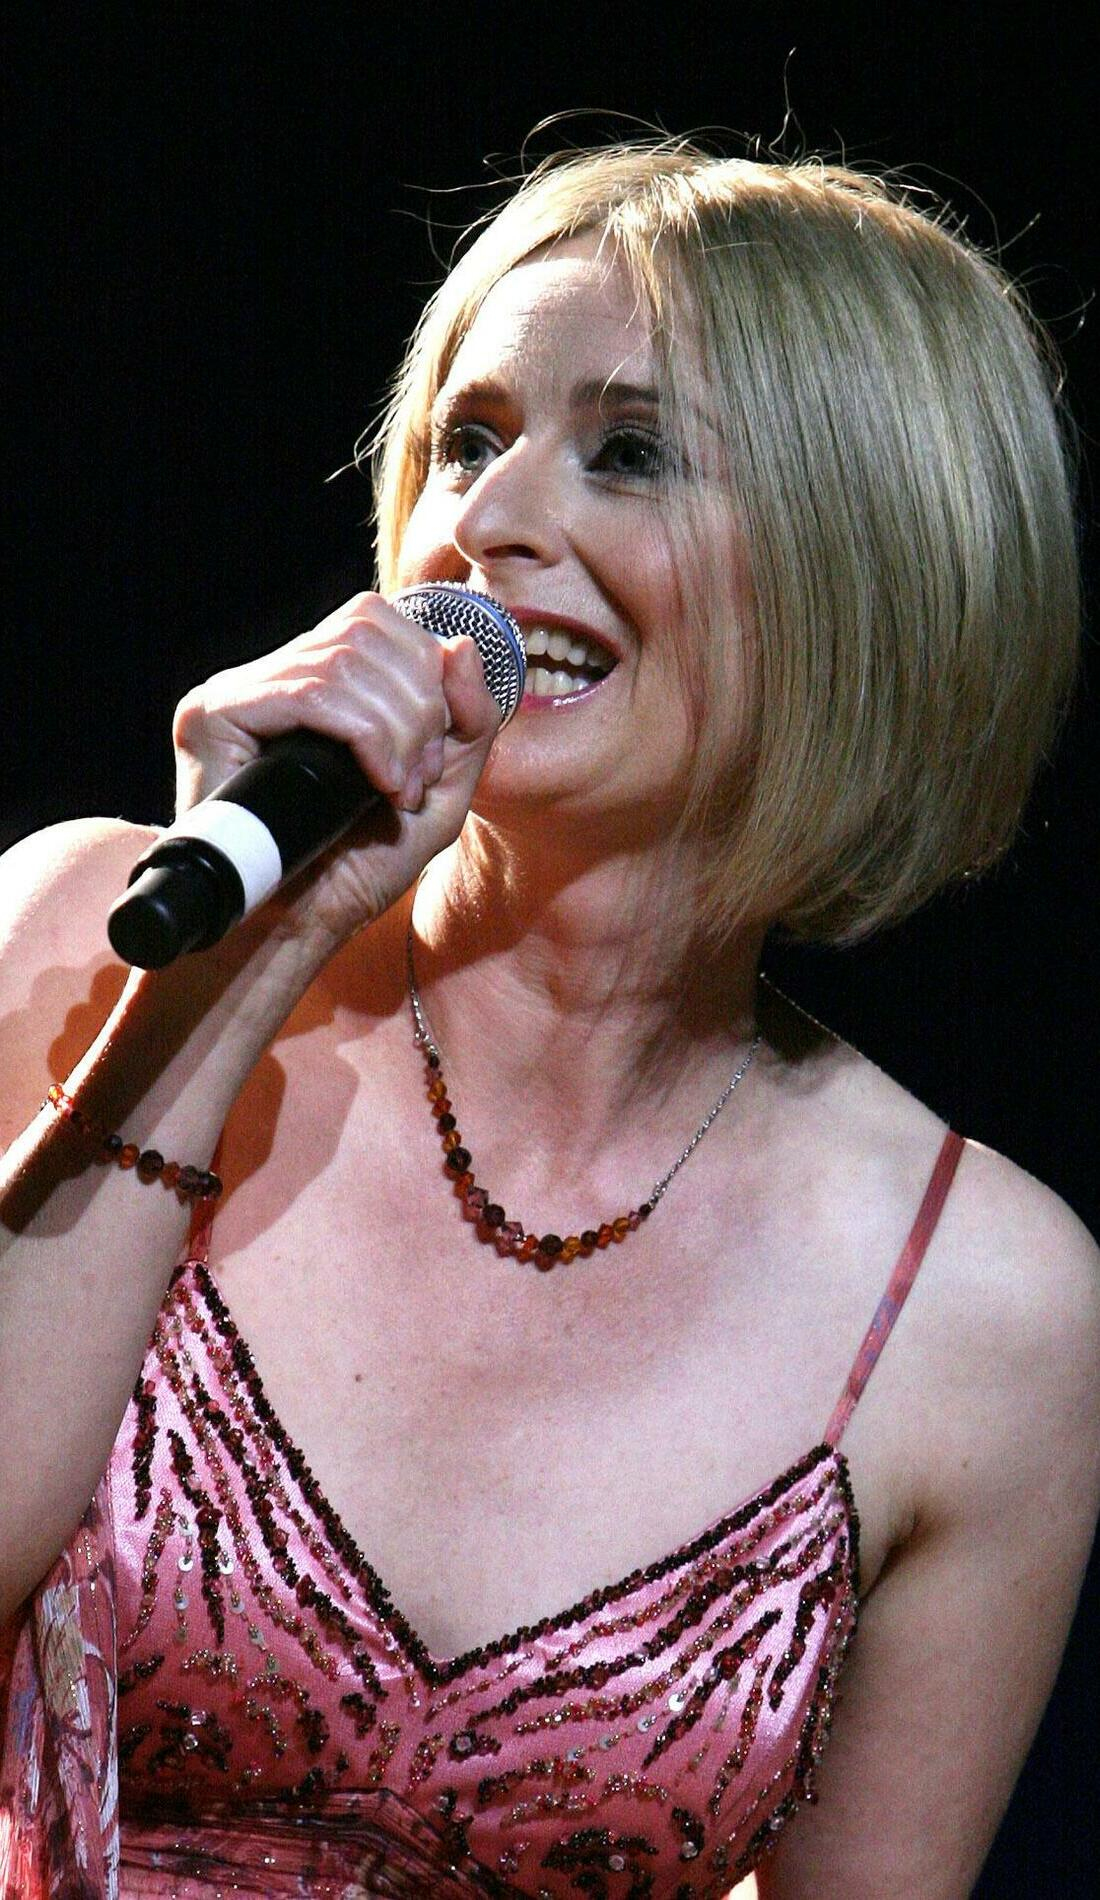 A Julia Fordham live event